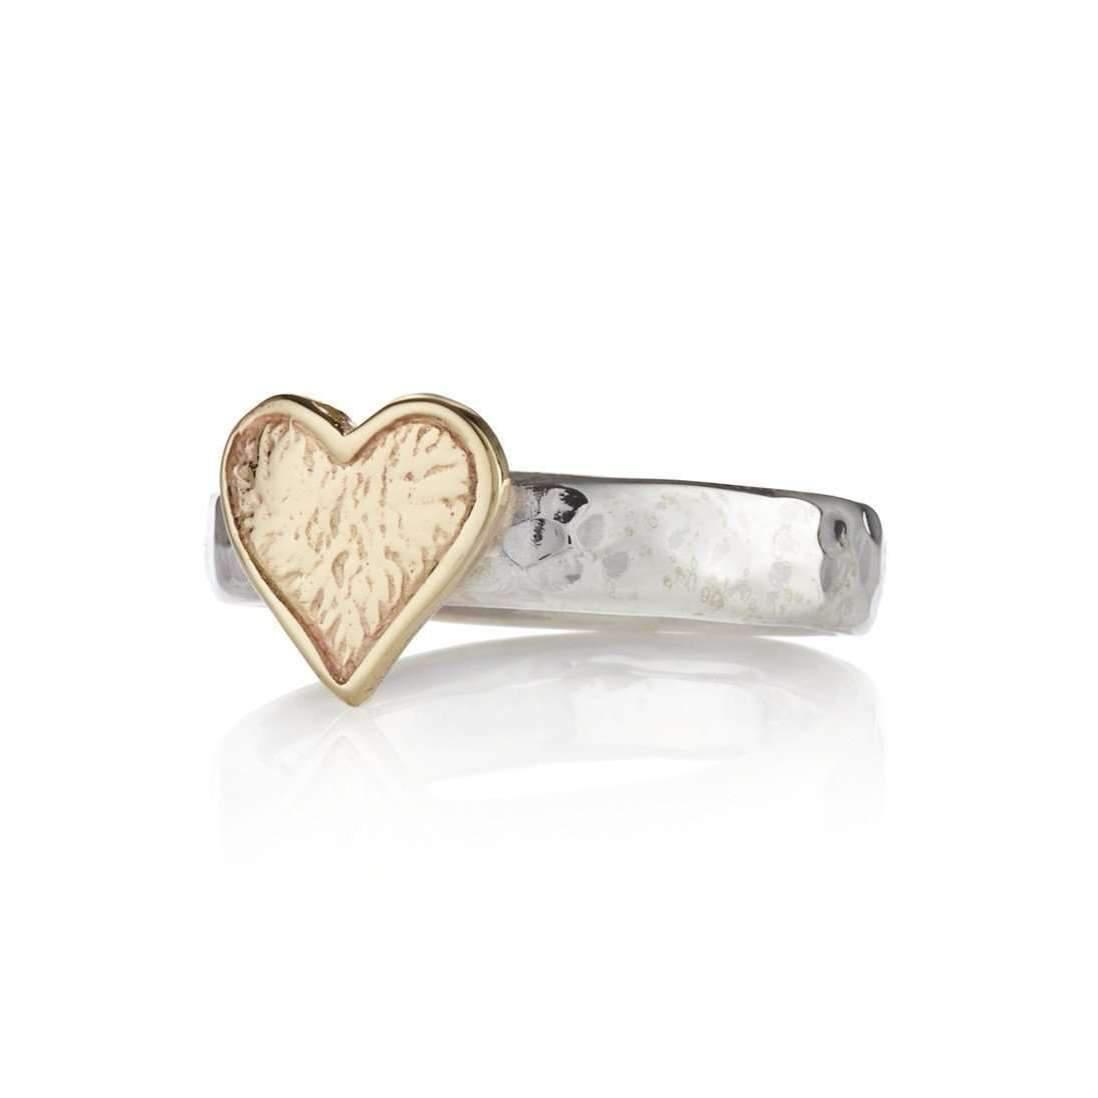 Lavan Heavy 9kt Gold & Hammered Sterling Silver Torq Ring - UK K 1/2 - US 5 3/8 - EU 50 3/4 dTGFmdW